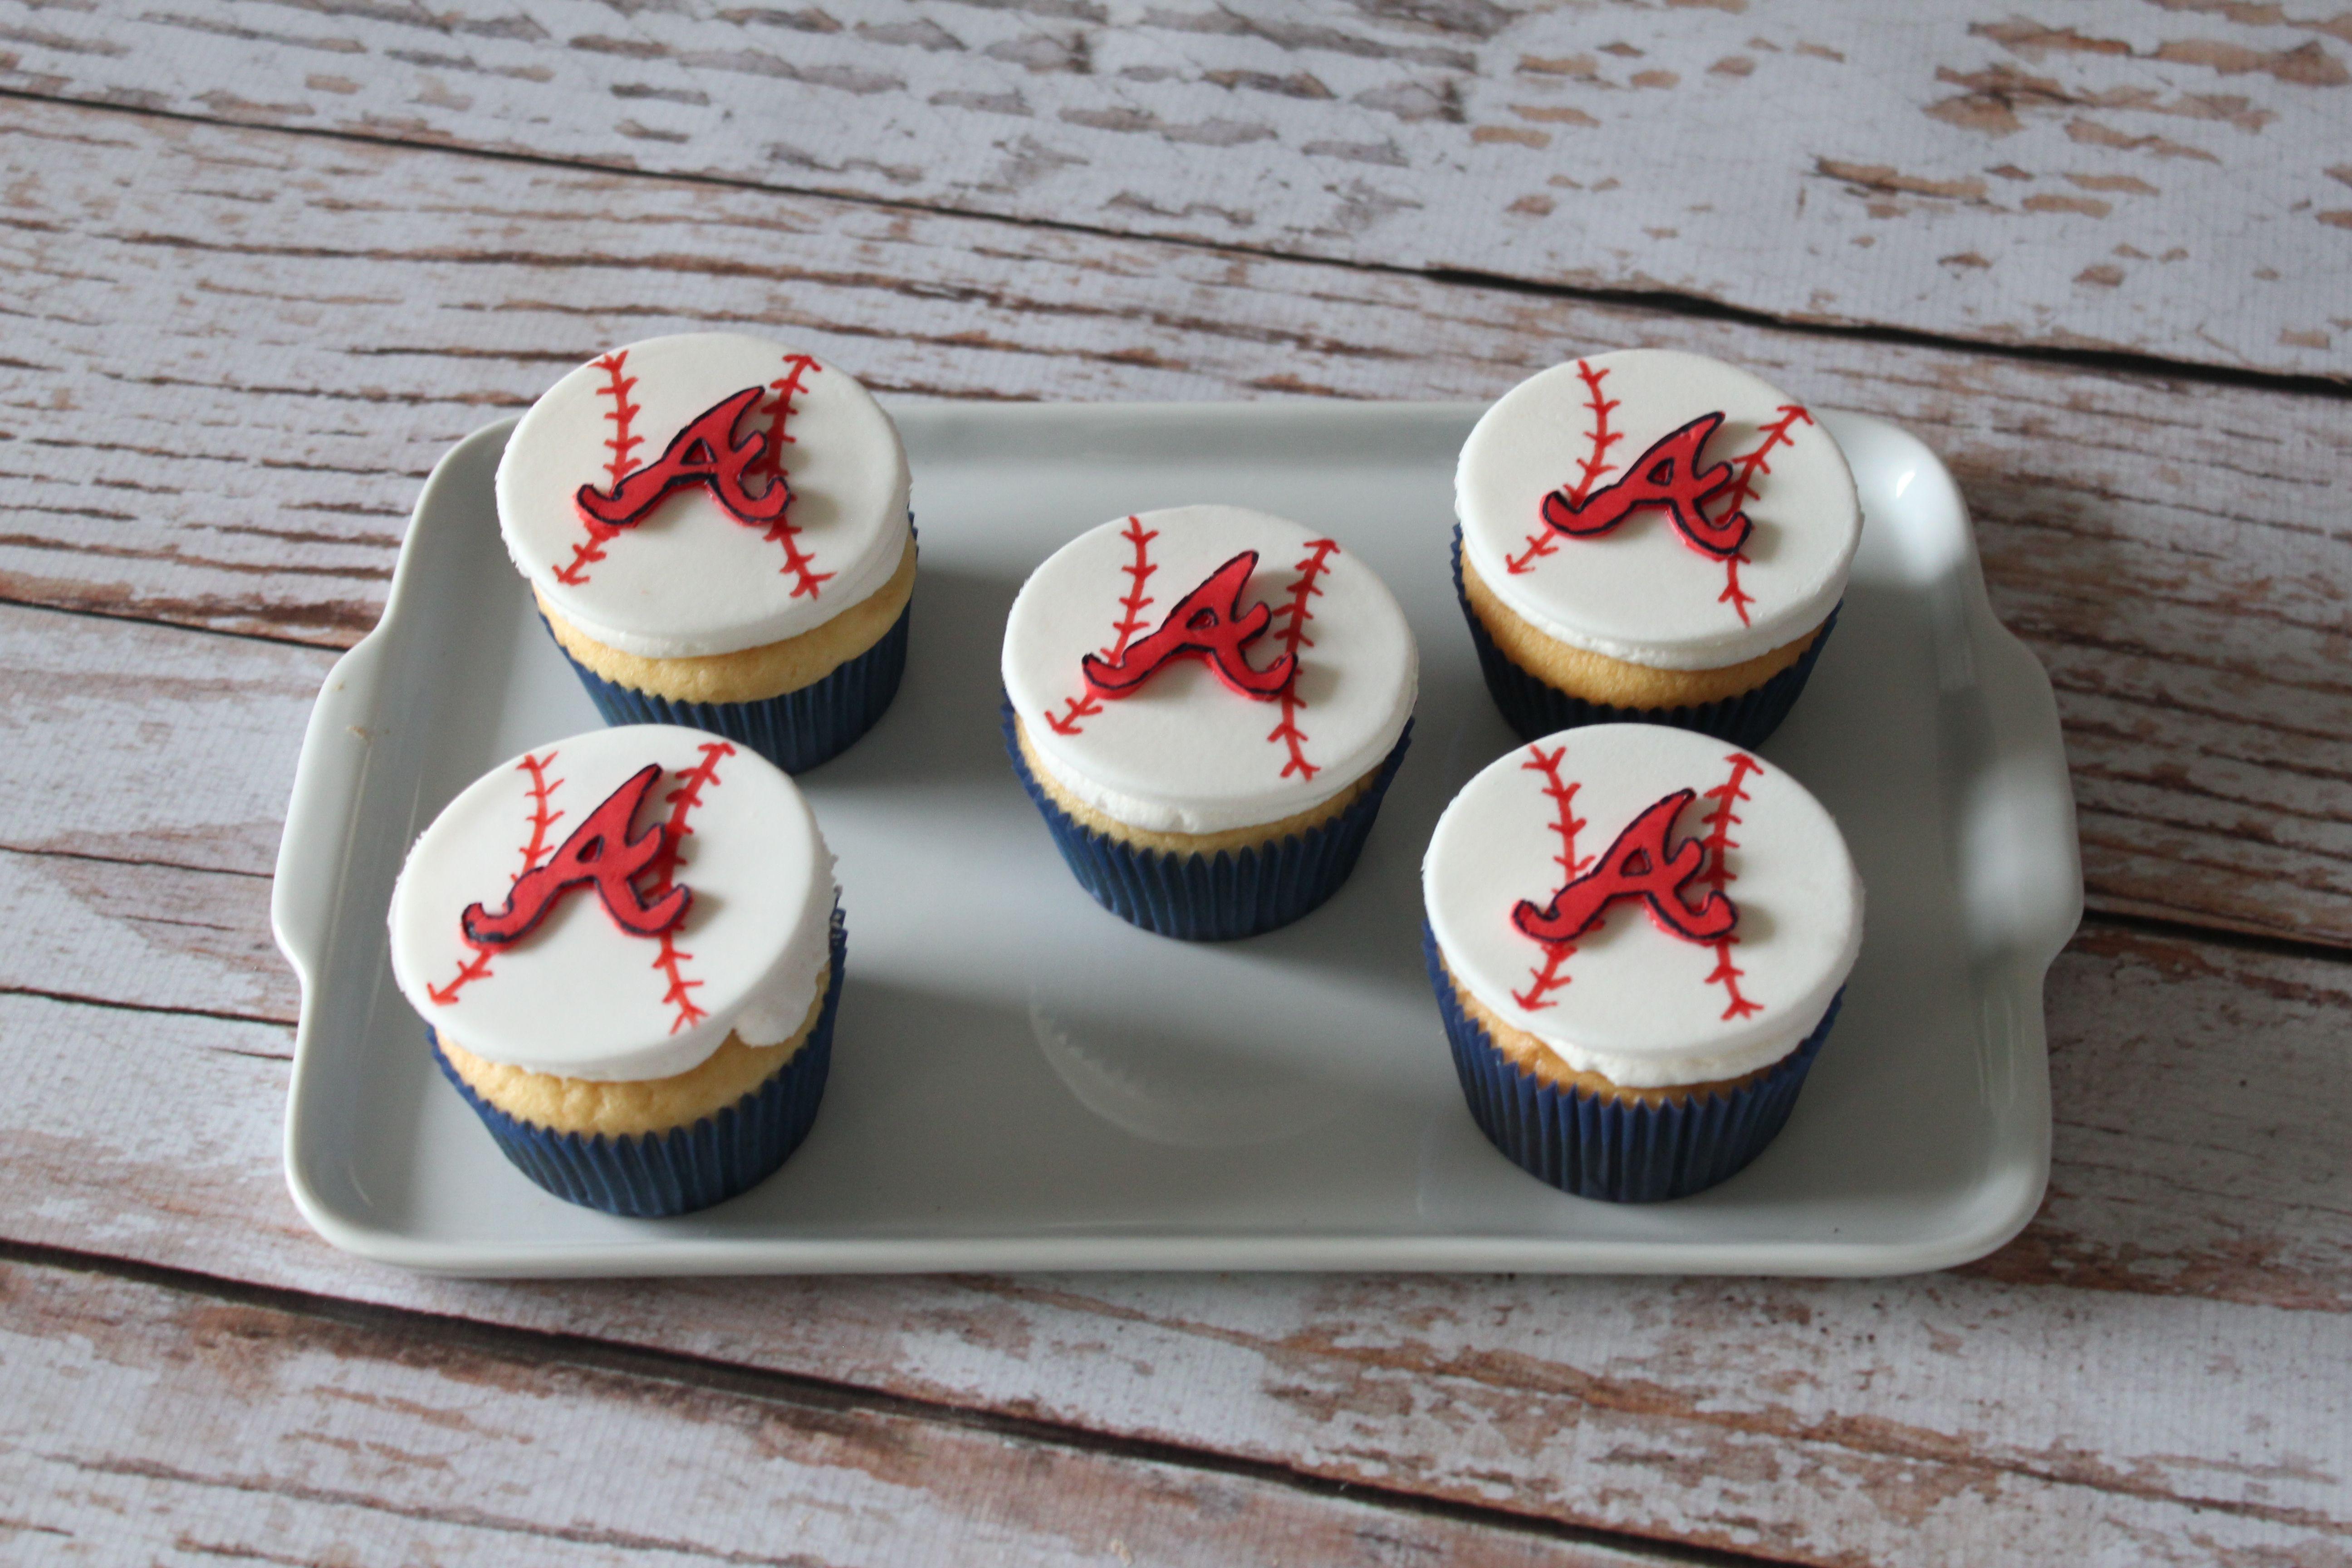 Atlanta Braves Cupcakes Cake Ops Cakery Birthday Party